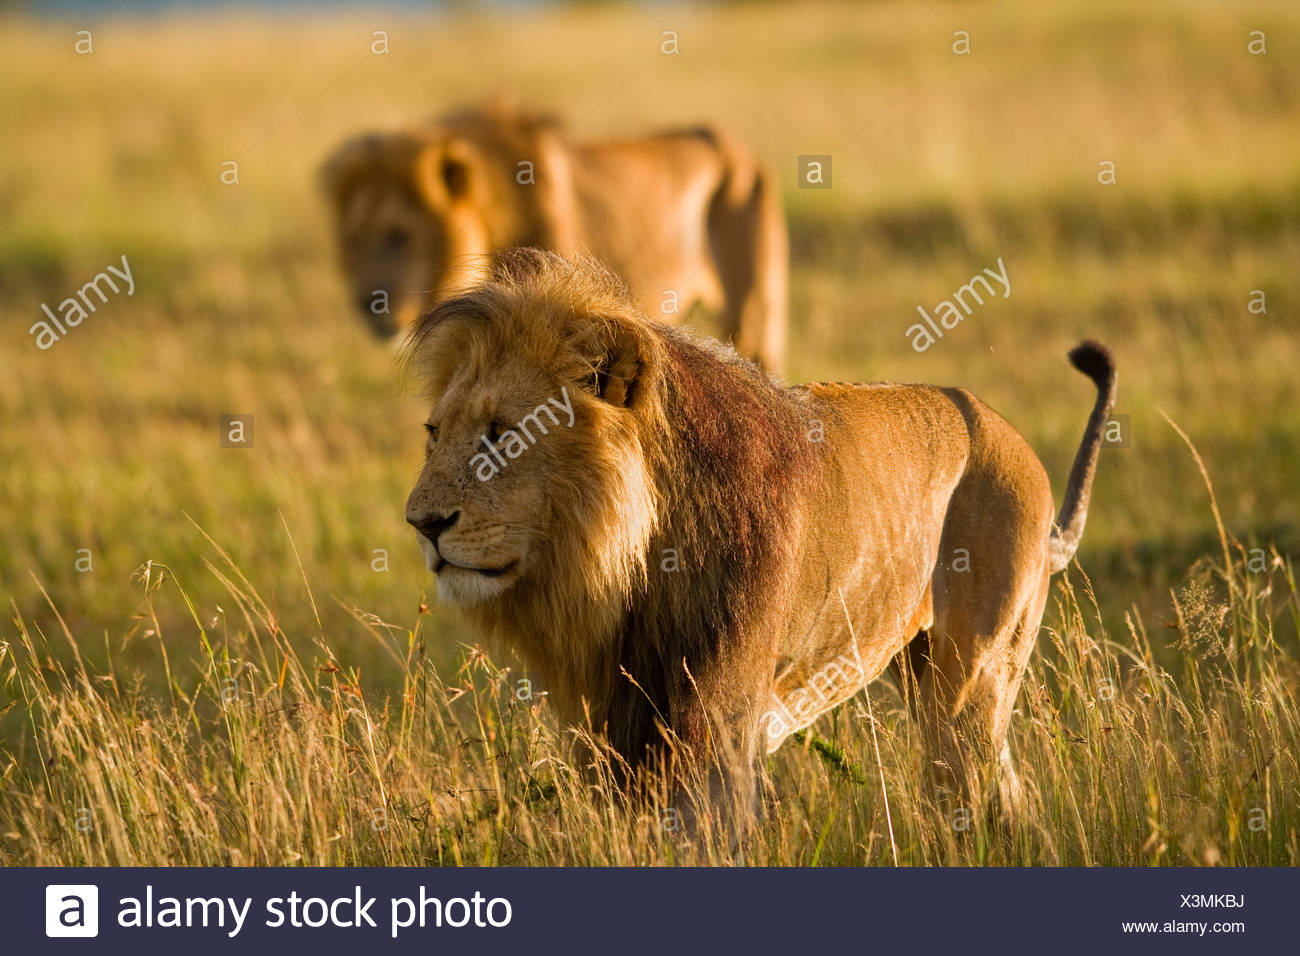 Lions keep an eye over their Masai Mara, Kenya domain. - Stock Image